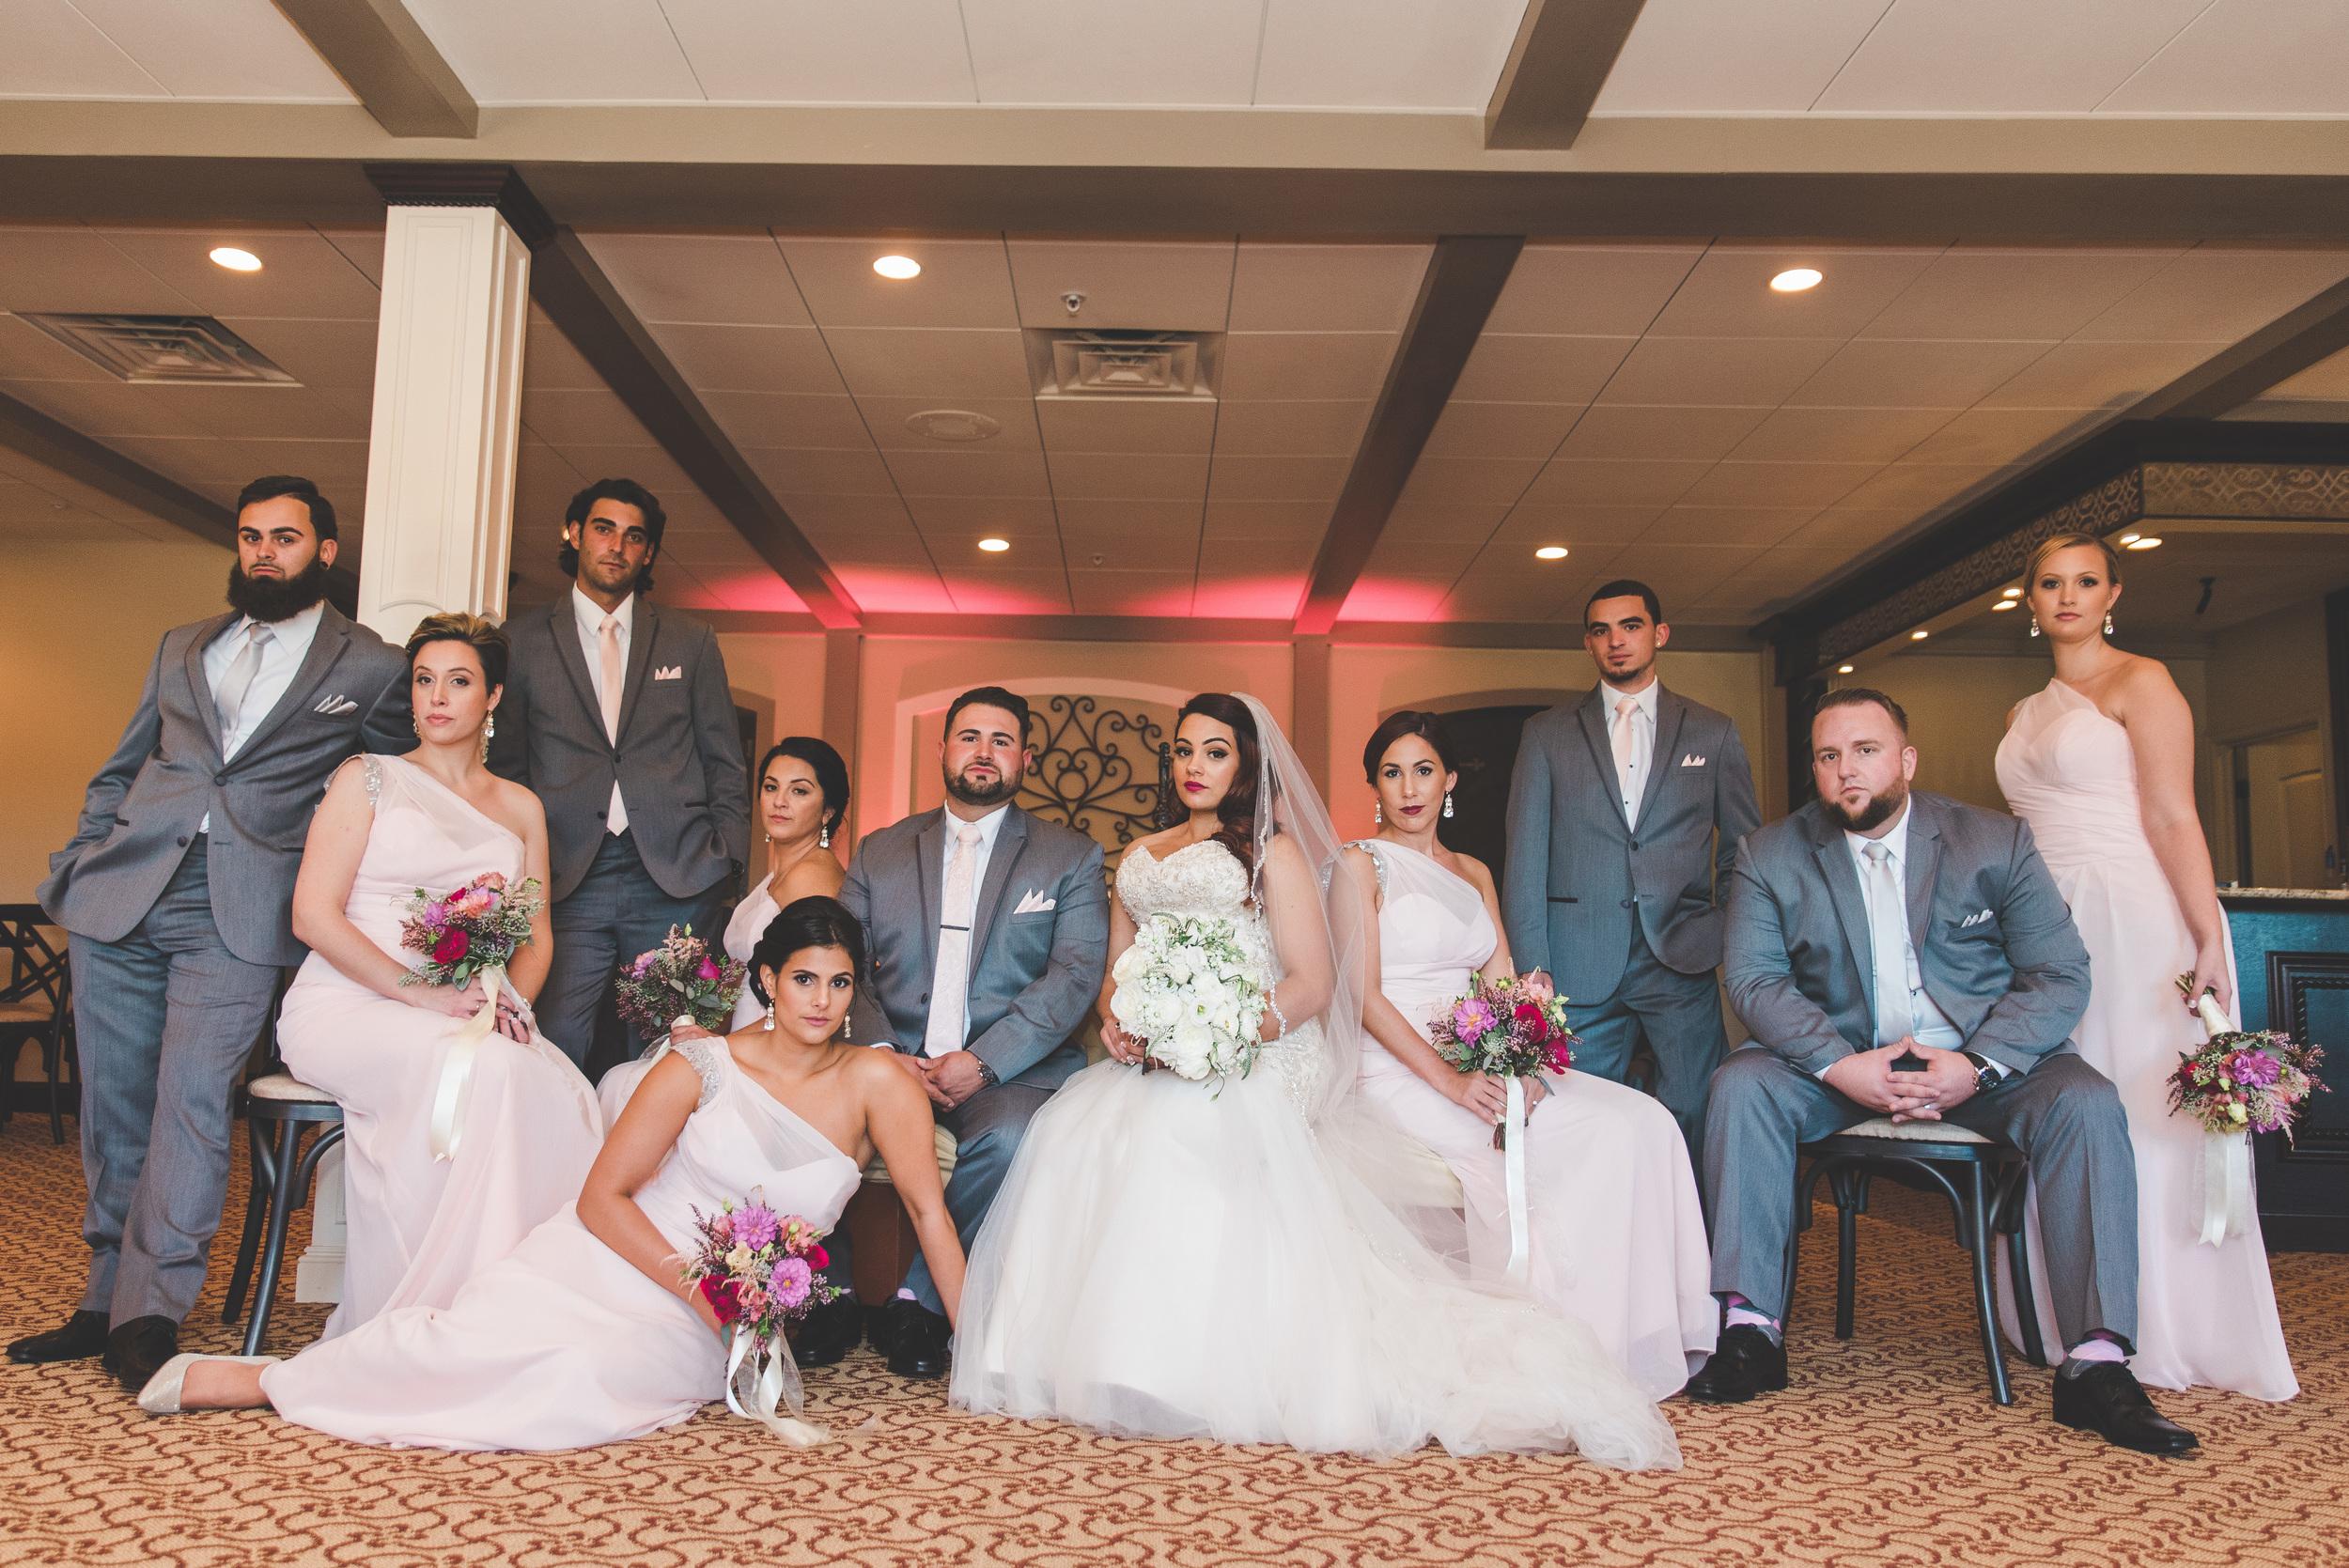 house of lubold photograph weddings-43.jpg